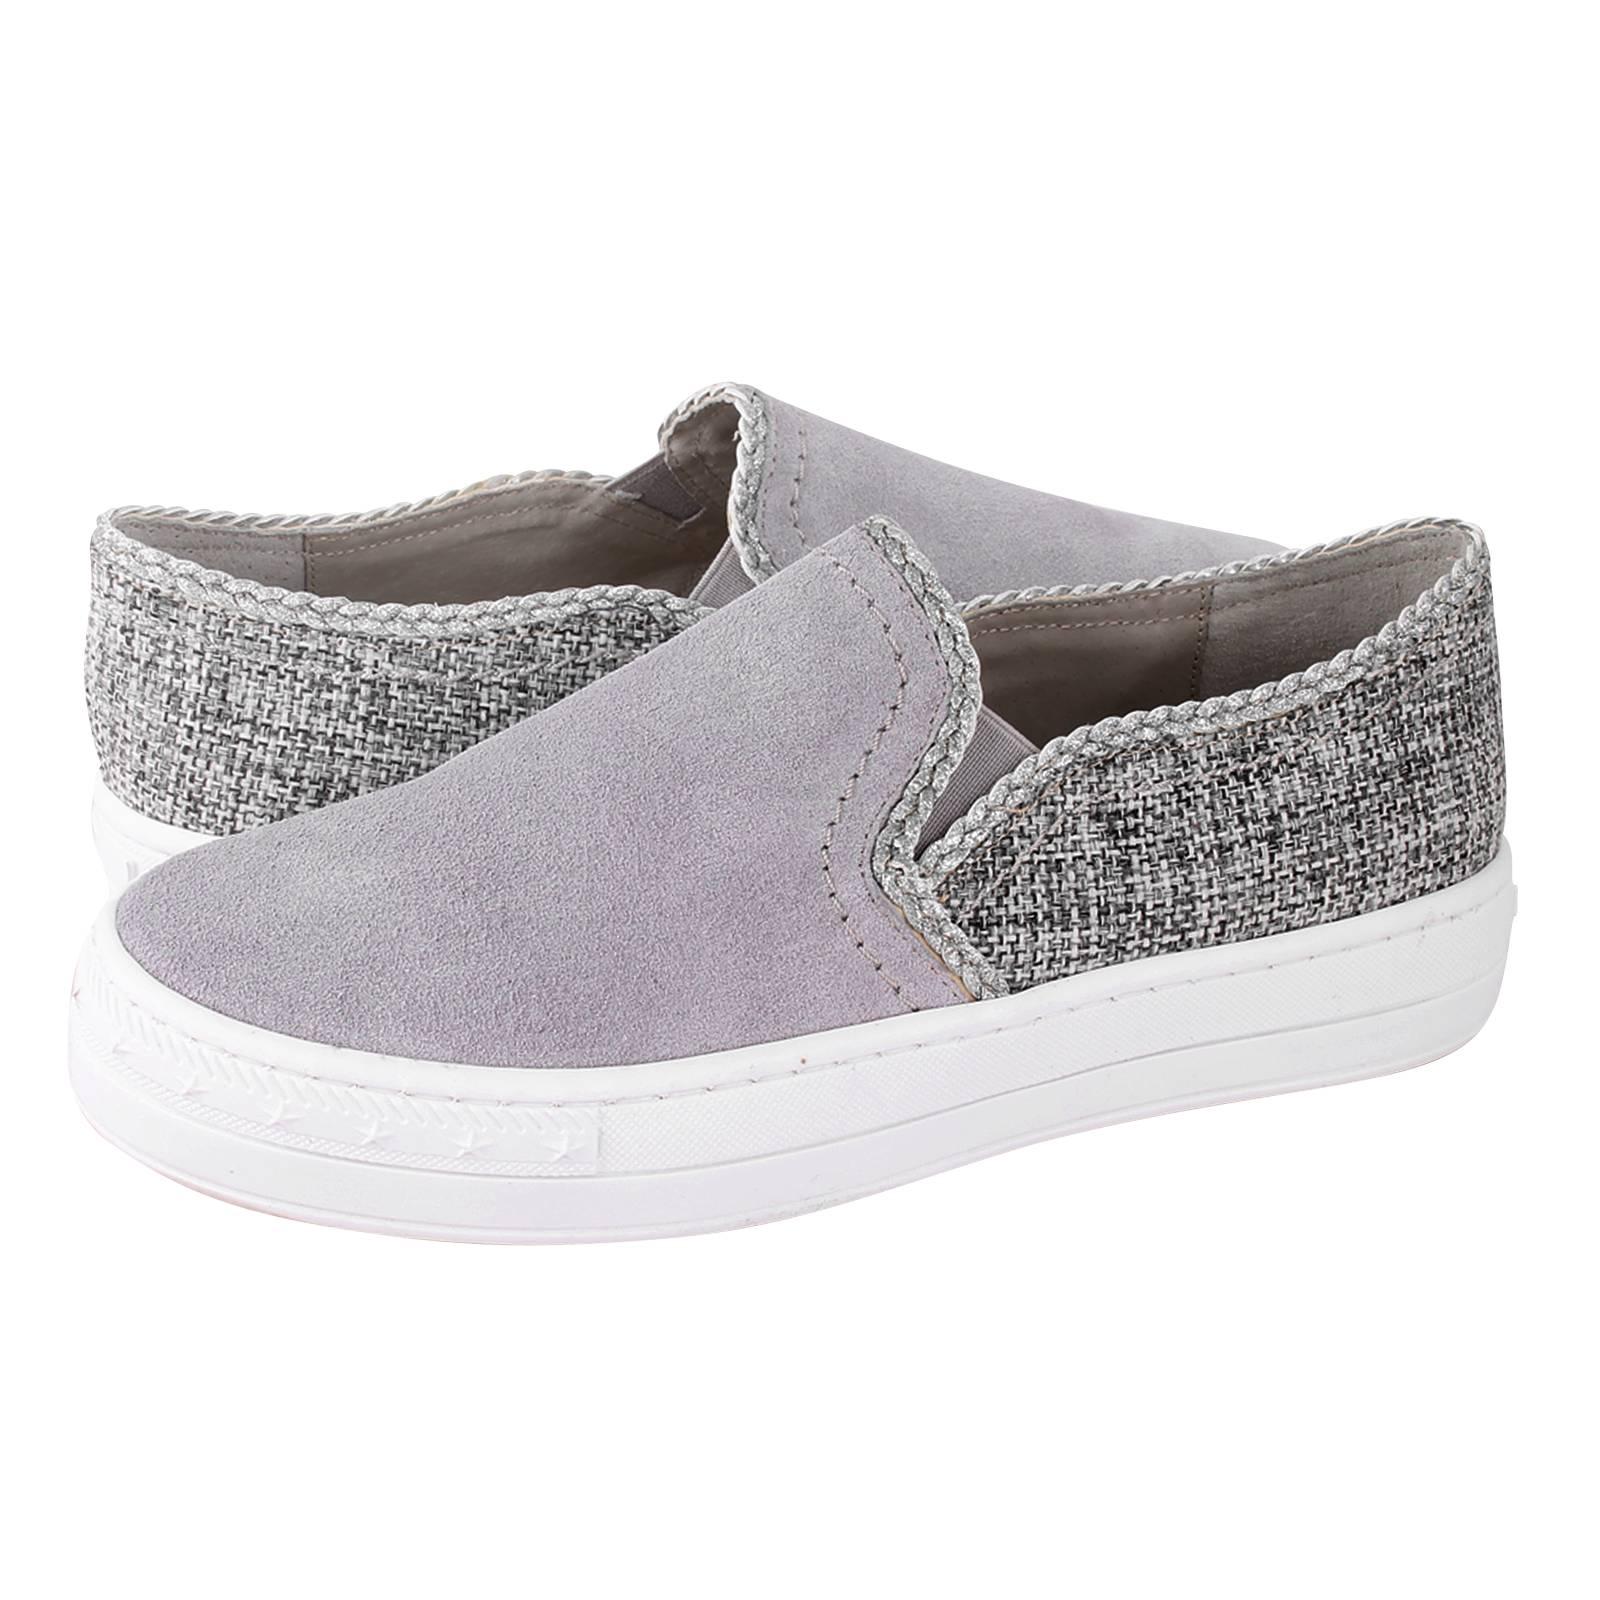 fbd24ea19db Παπούτσια casual Esthissis Catende